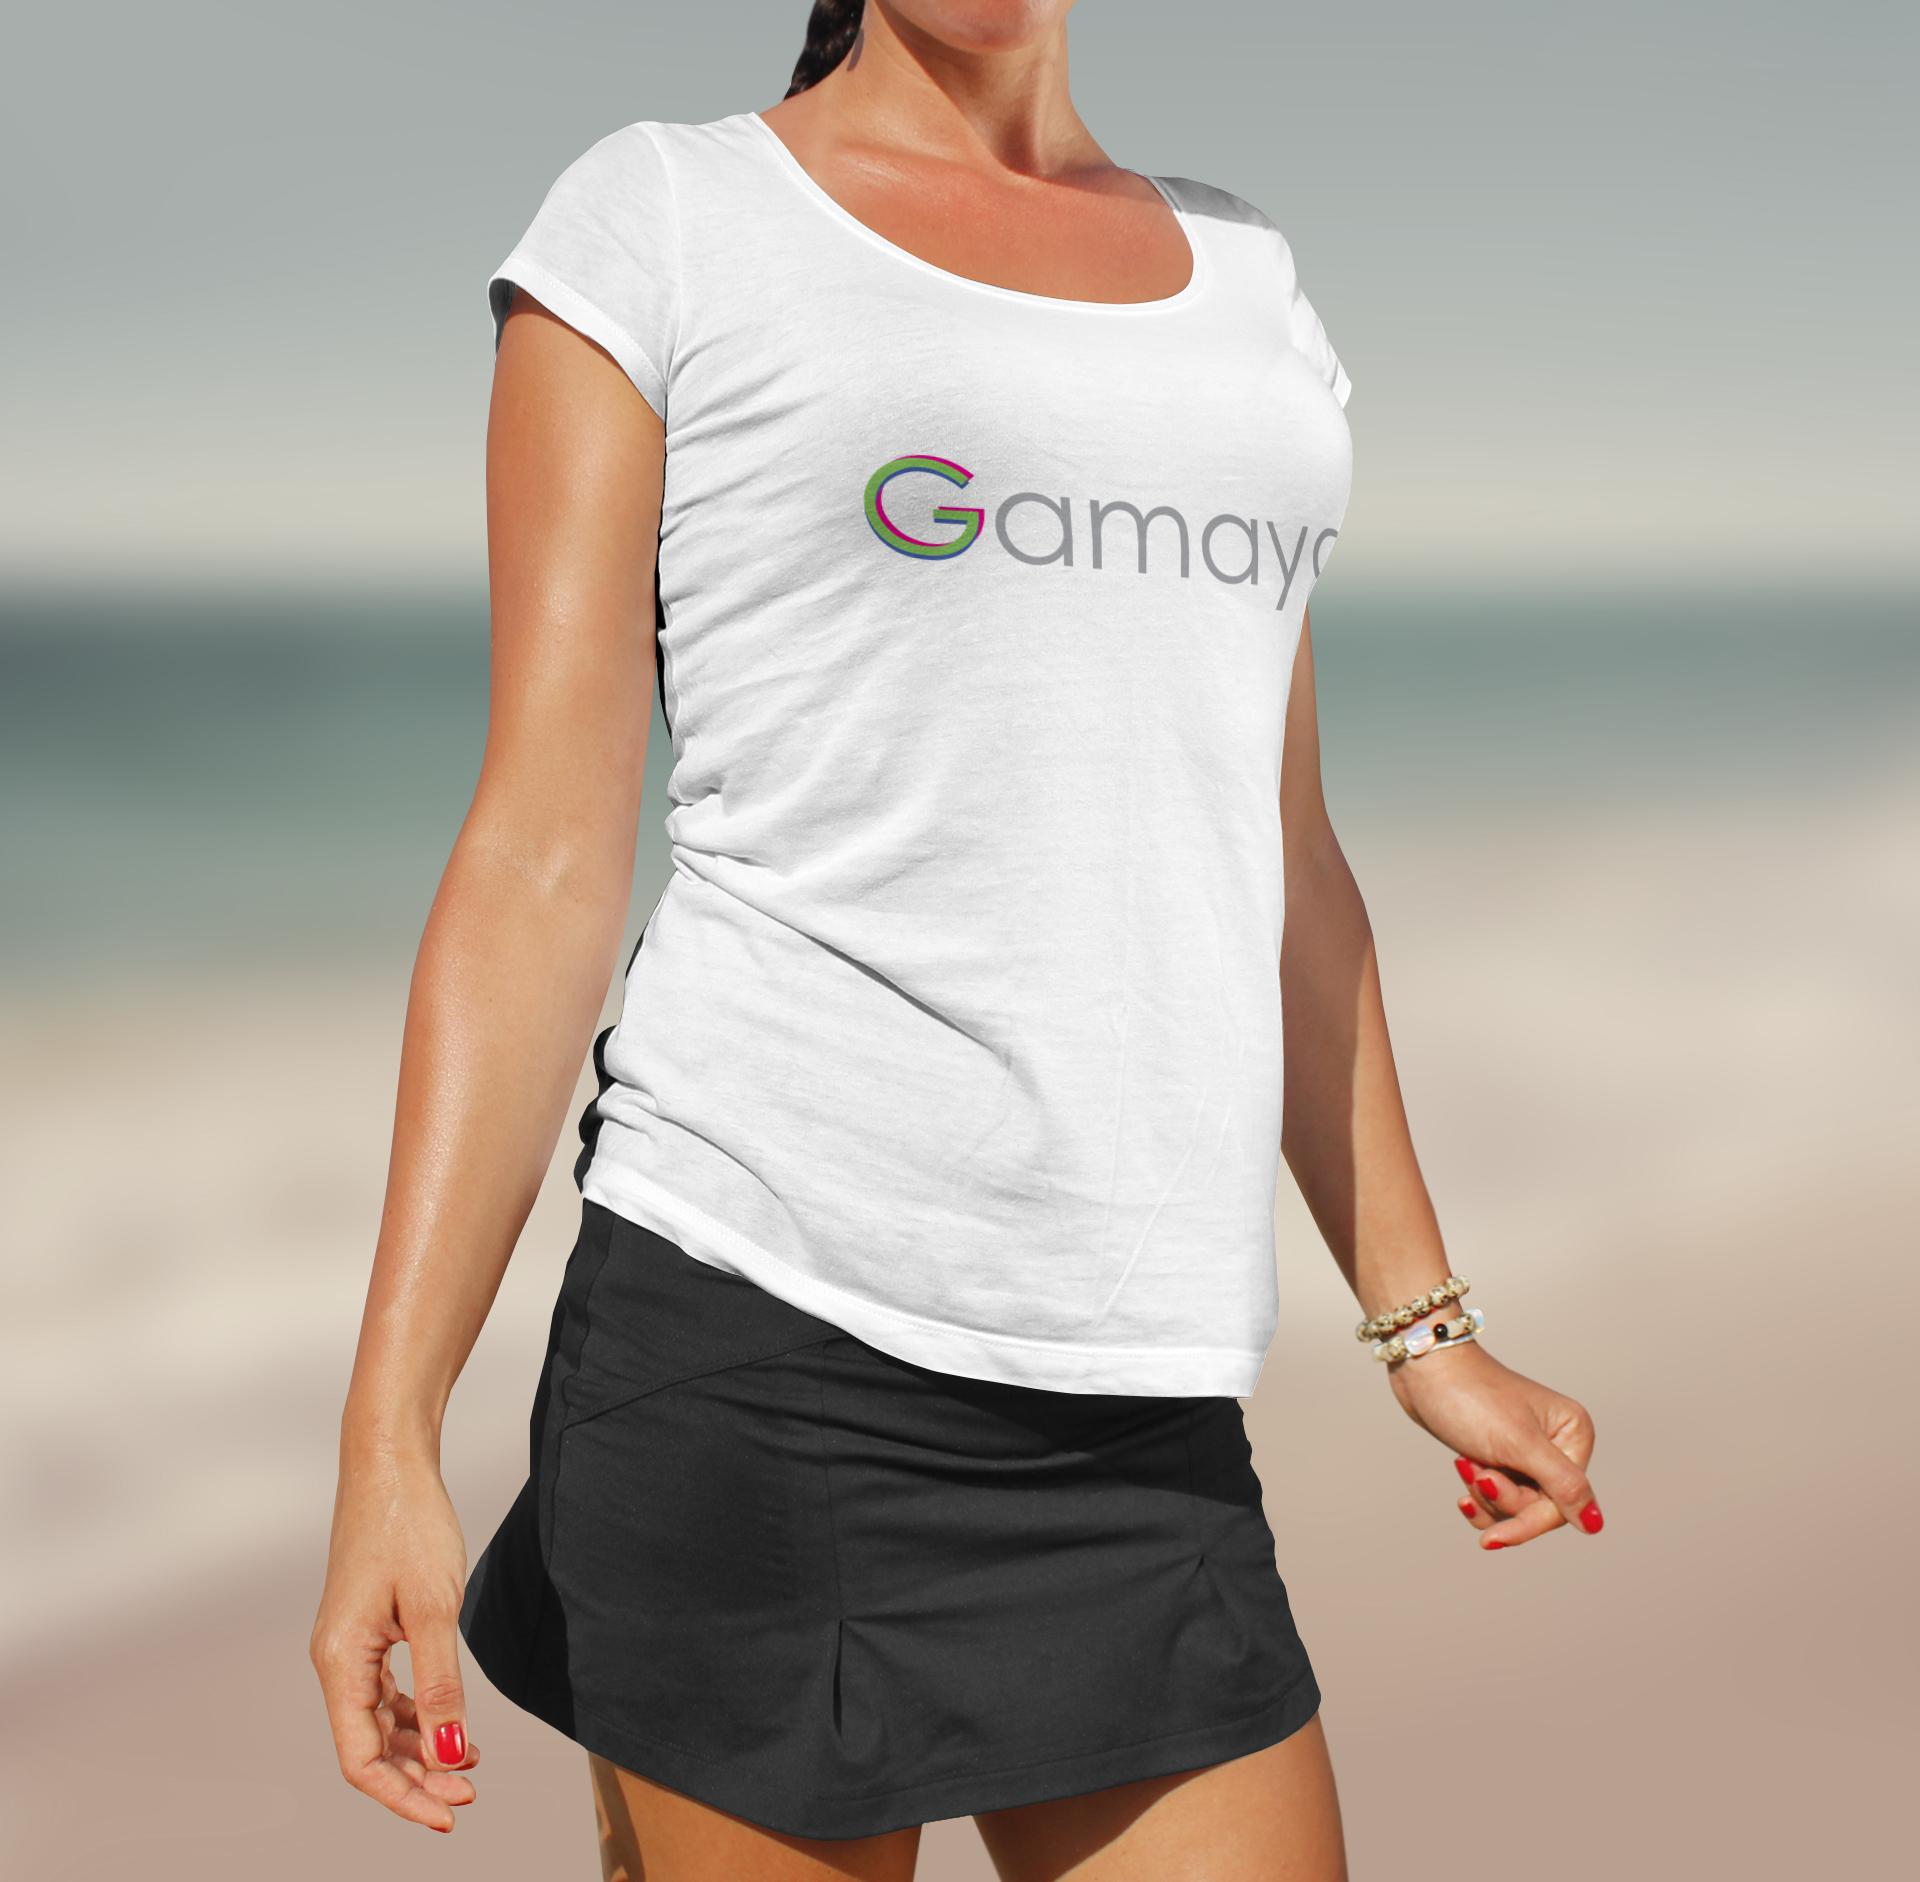 Разработка логотипа для компании Gamaya фото f_5925484a6aeba17d.jpg